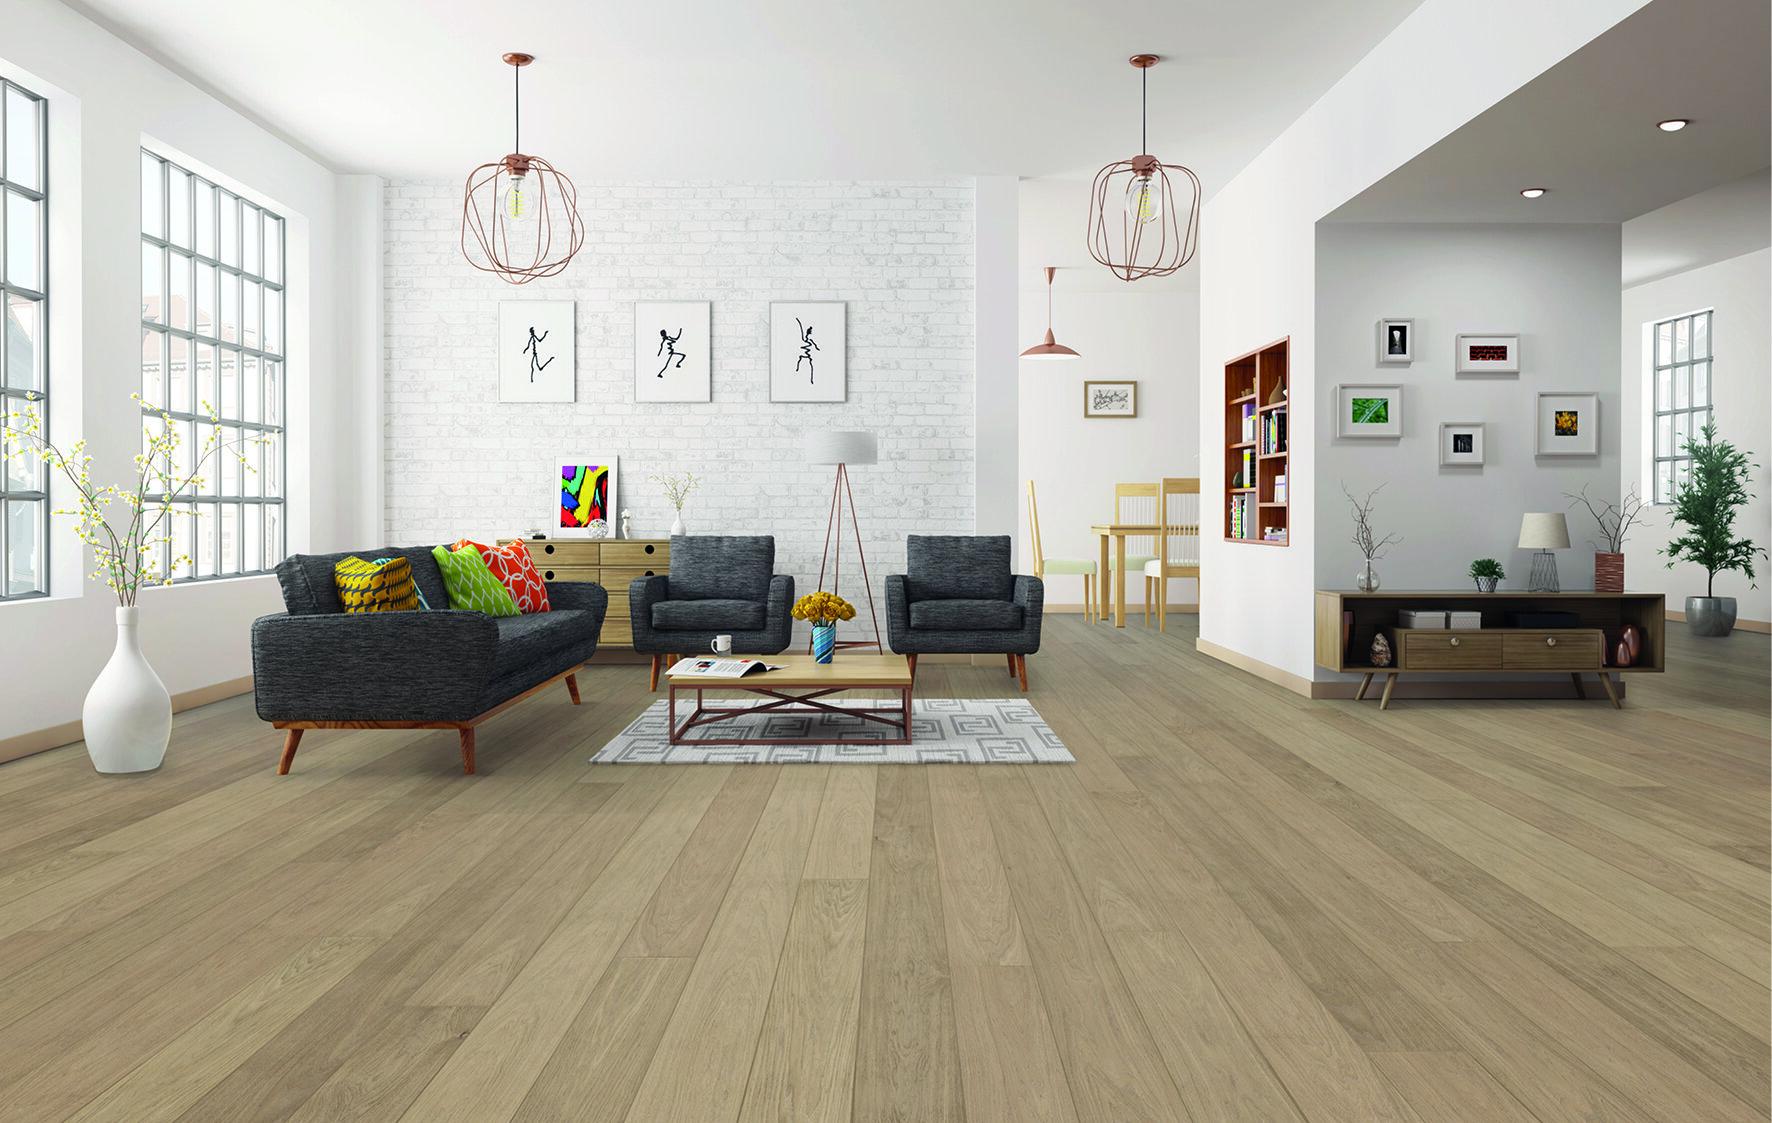 Select Serene 3 - Room environment.jpg